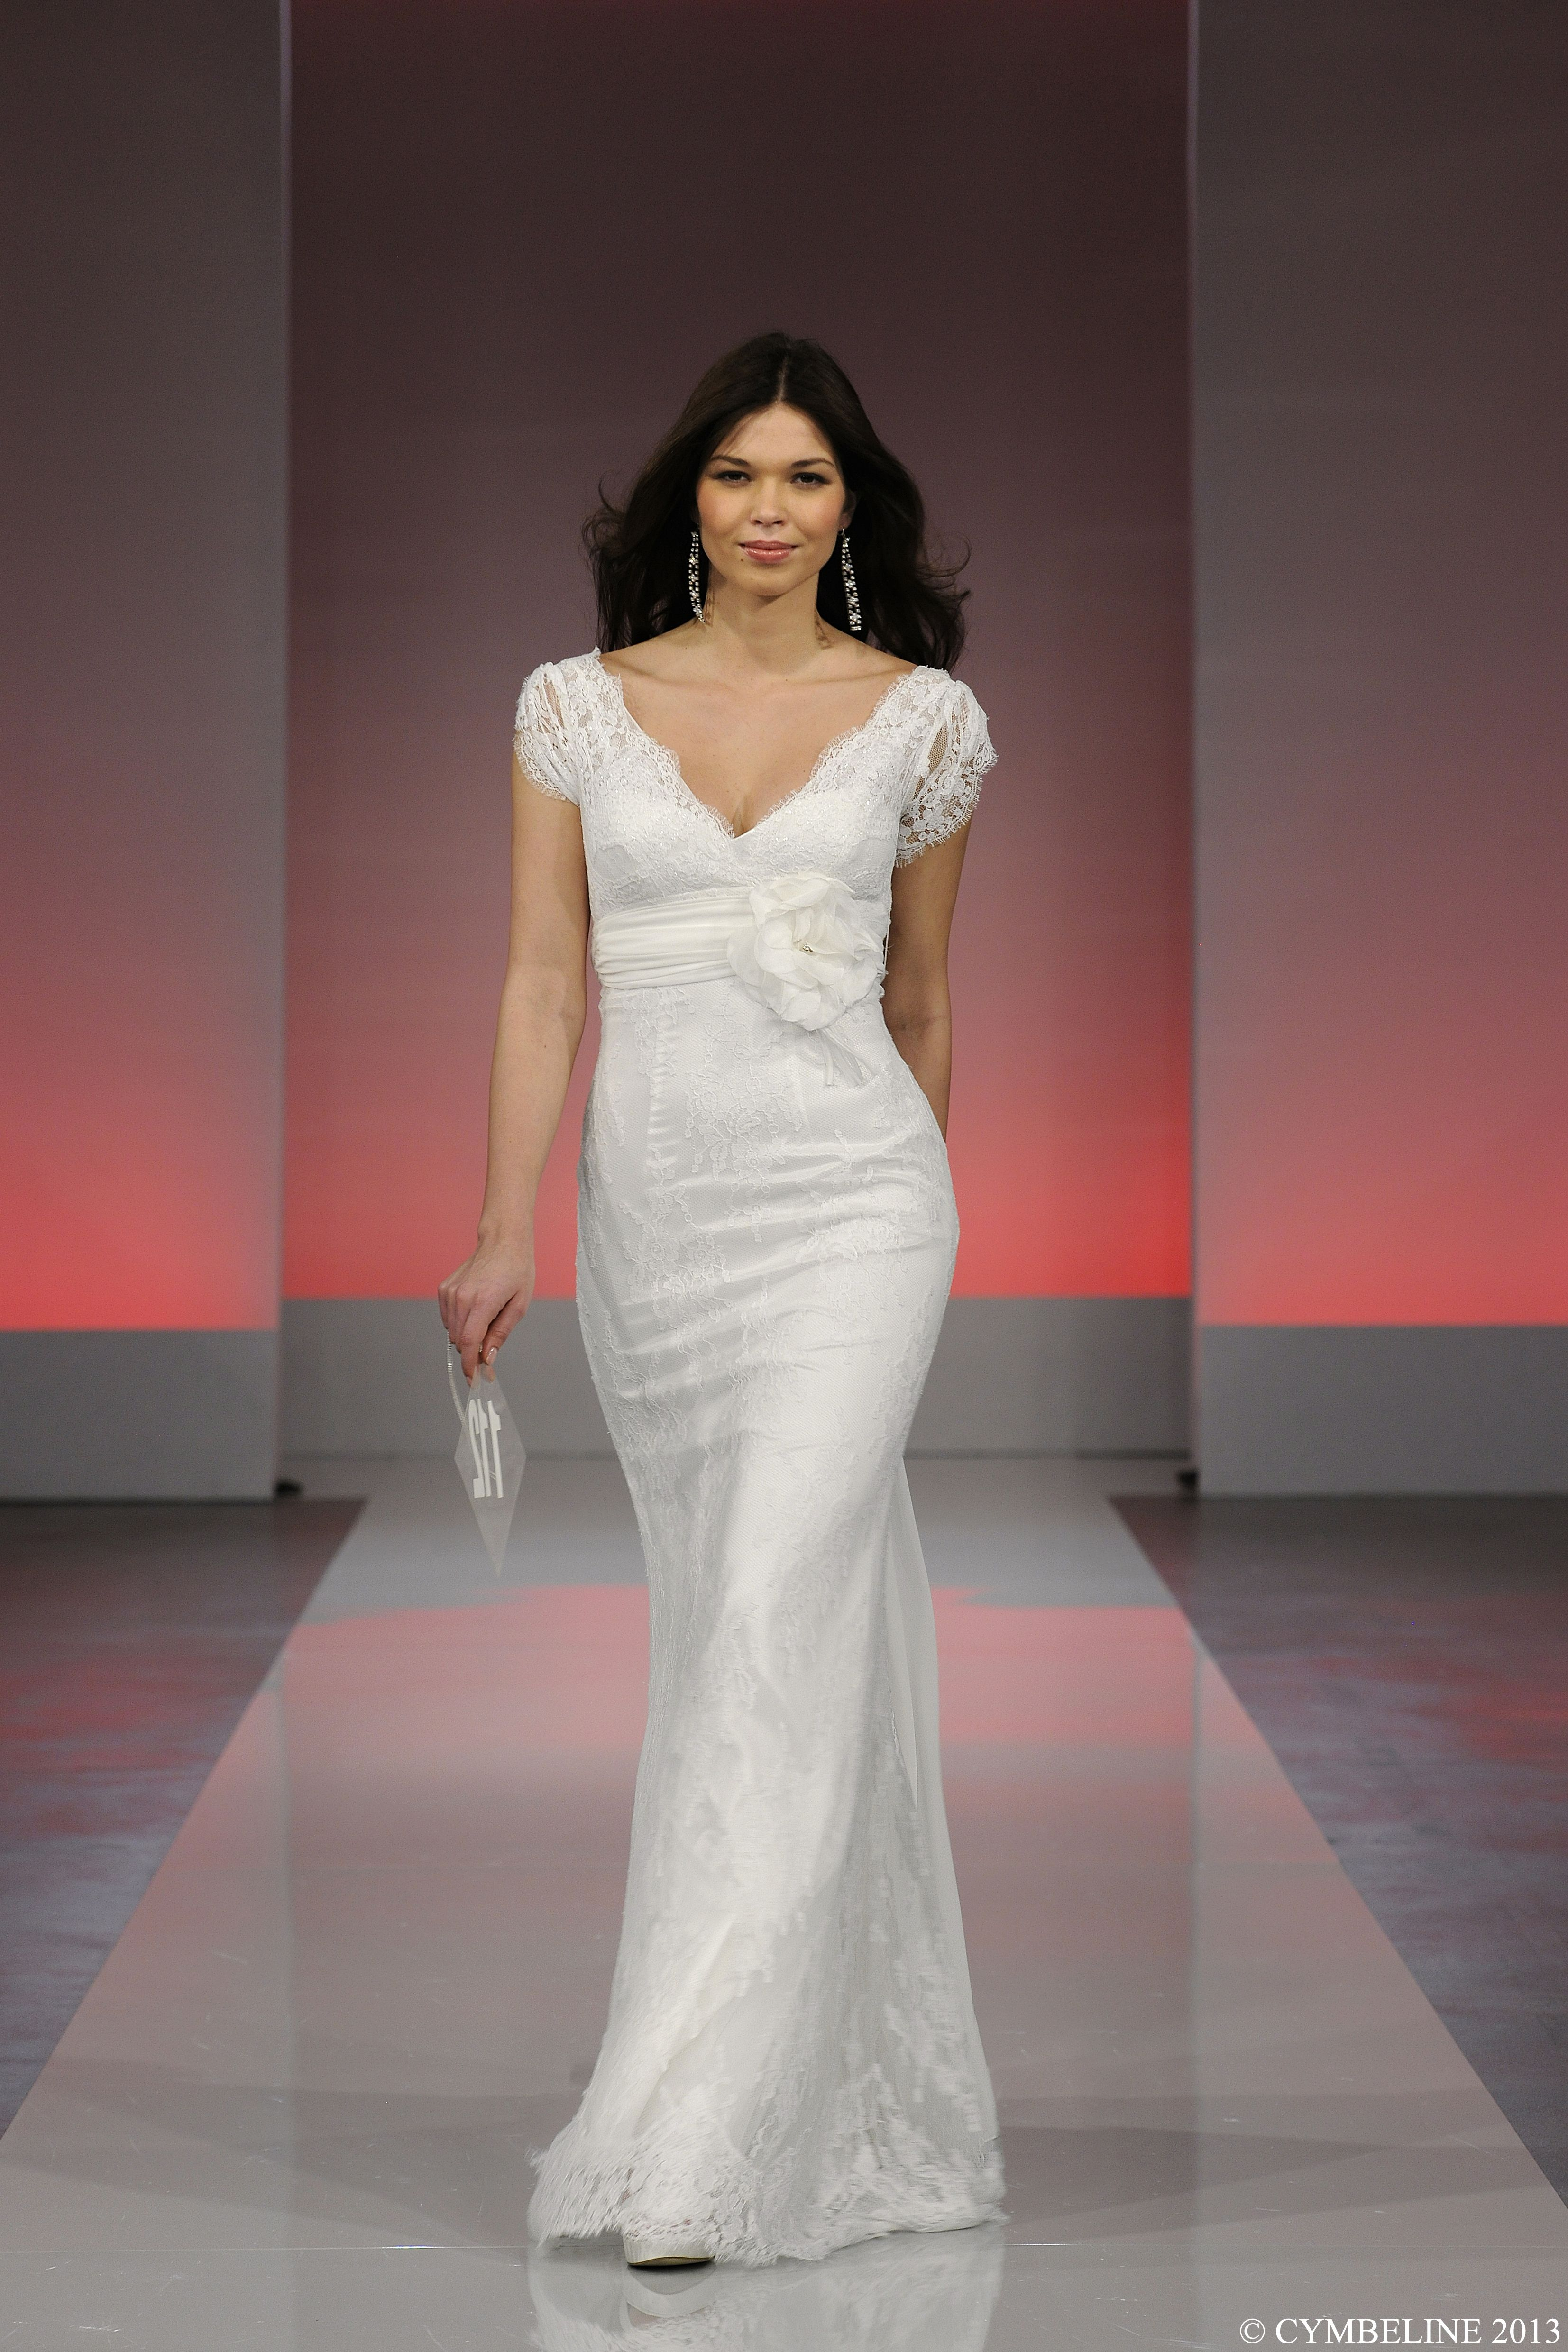 Gala 1900 Ceinture Fournie Wedding Dresses Wedding Dresses For Sale Wedding Dress Inspiration [ 4961 x 3307 Pixel ]